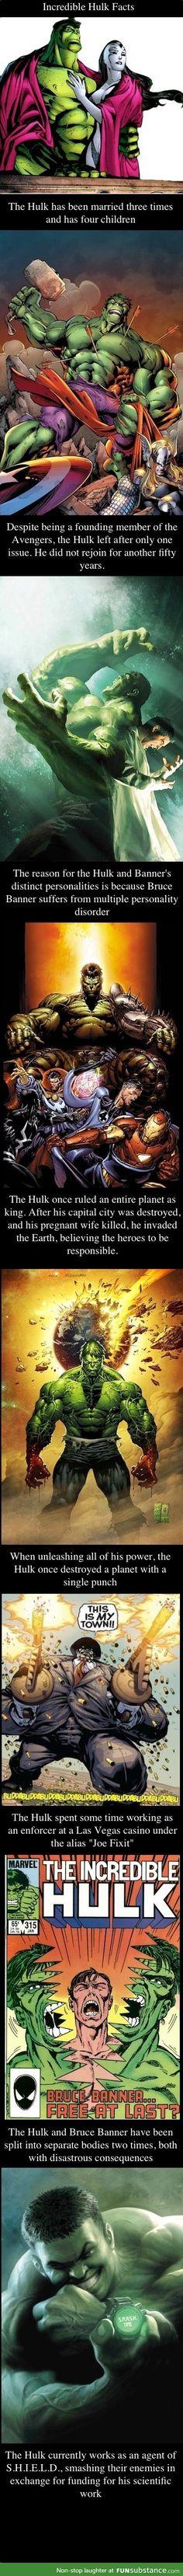 Incredible hulk facts compilation